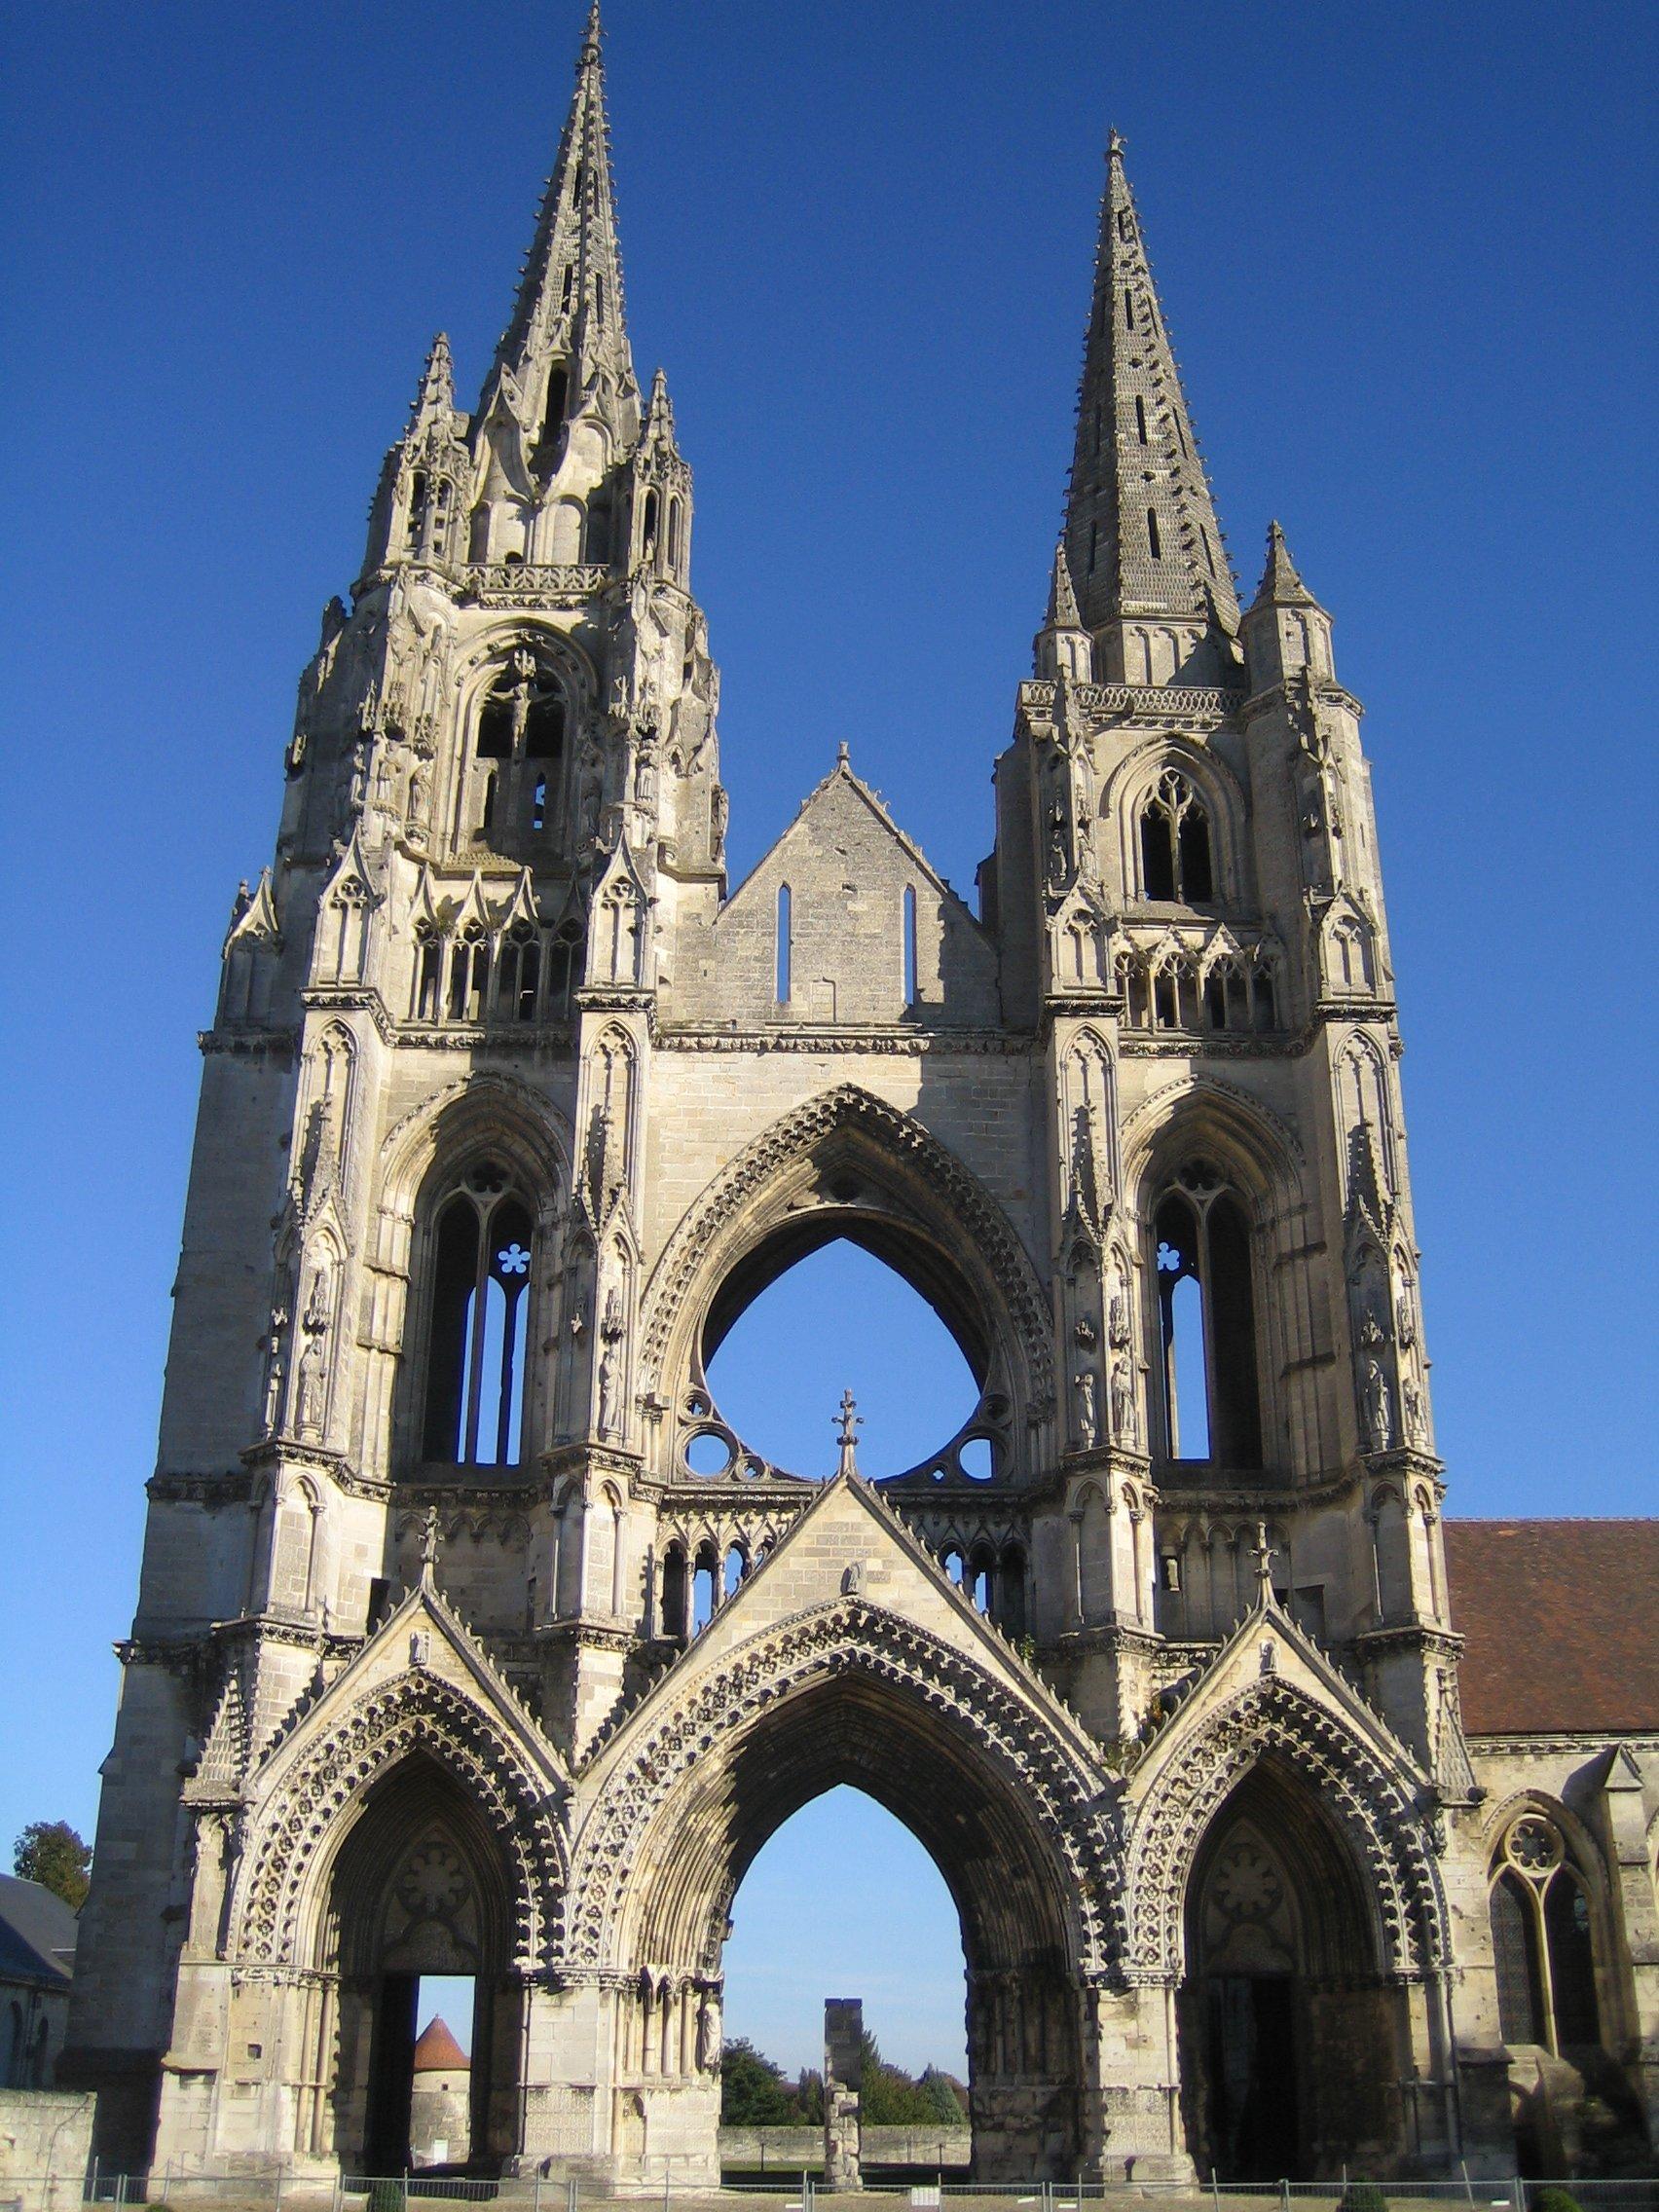 Abbaye Saint Jean Des Vignes : abbaye, saint, vignes, File:Soissons-saint-jean-des-vignes.jpg, Wikimedia, Commons